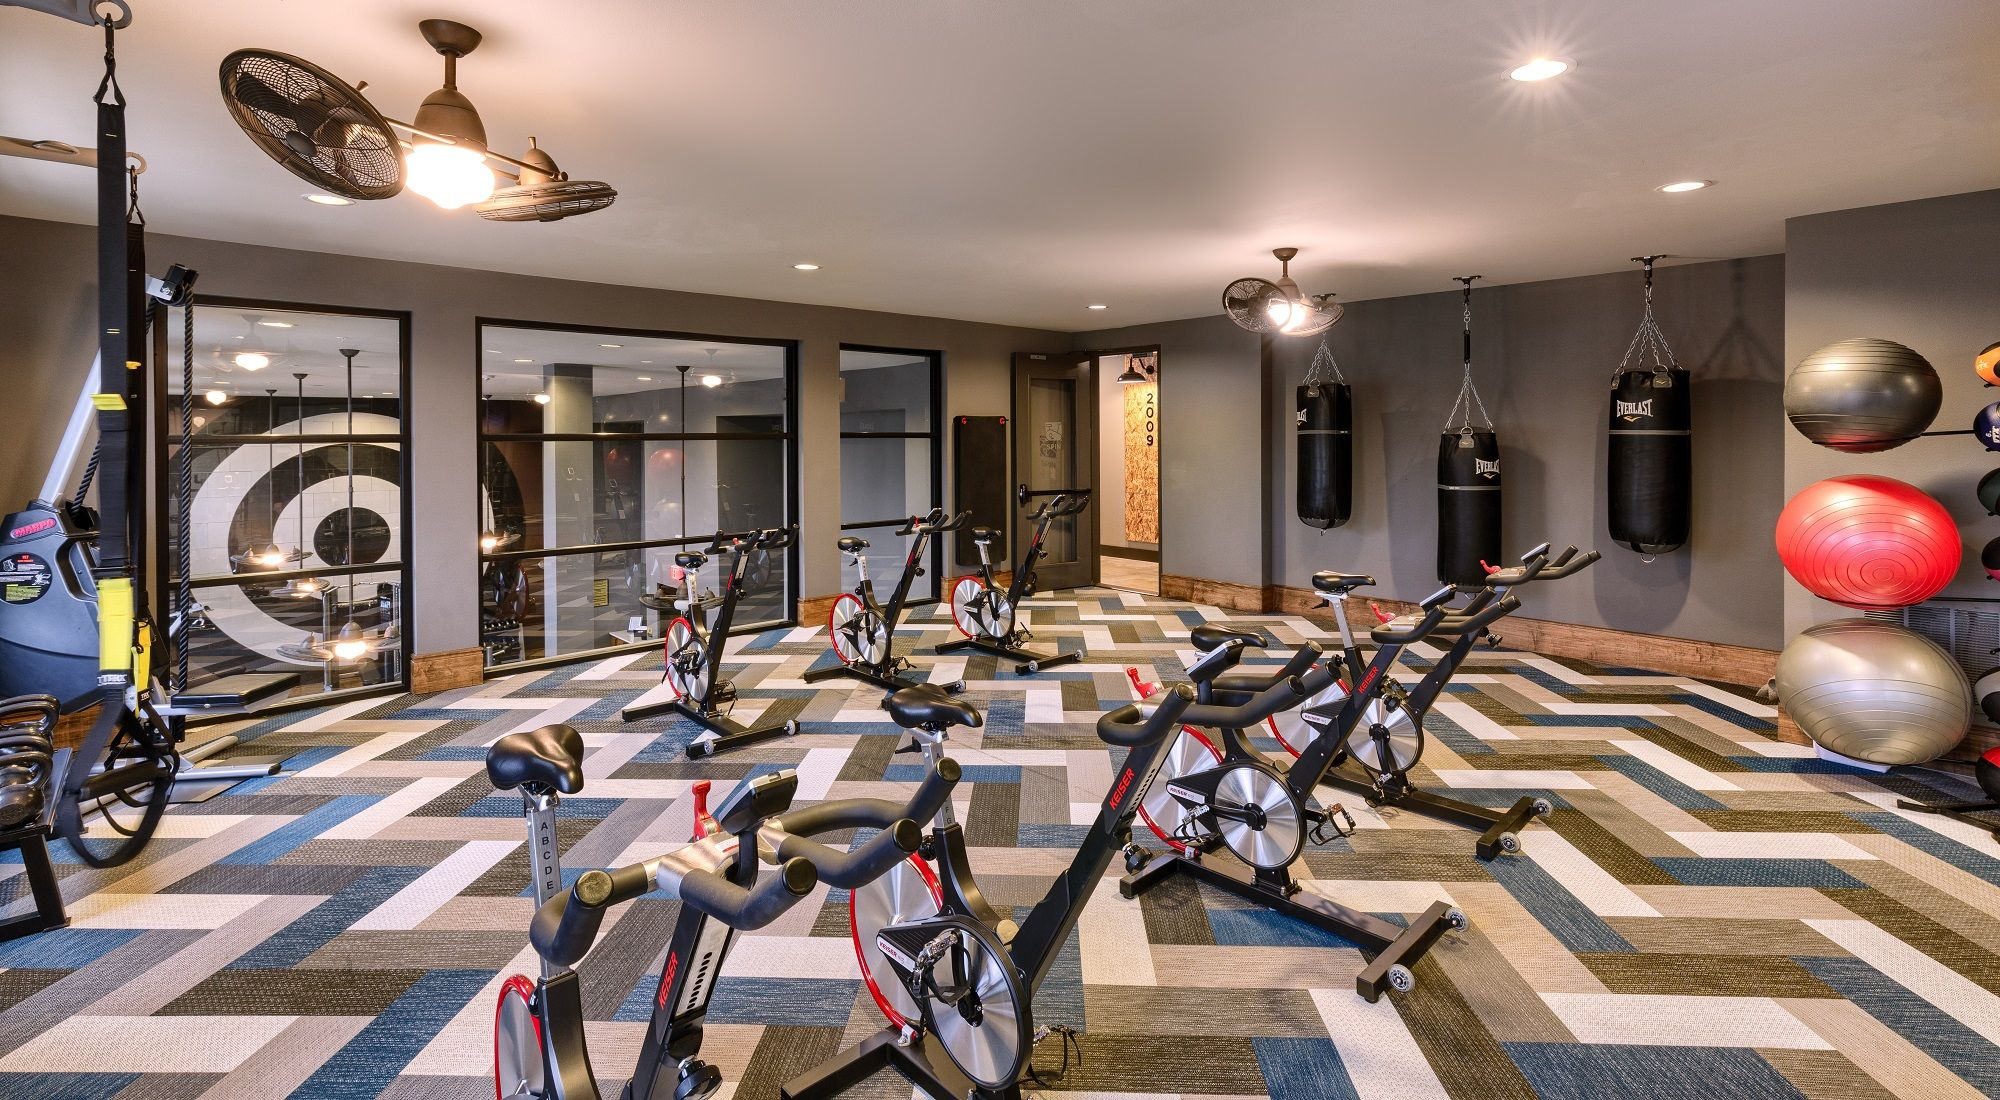 Aura Cedar Contemporary Apartment Living In Uptown Dallas Texas Fitness Center Design Contemporary Apartment Luxury Apartments